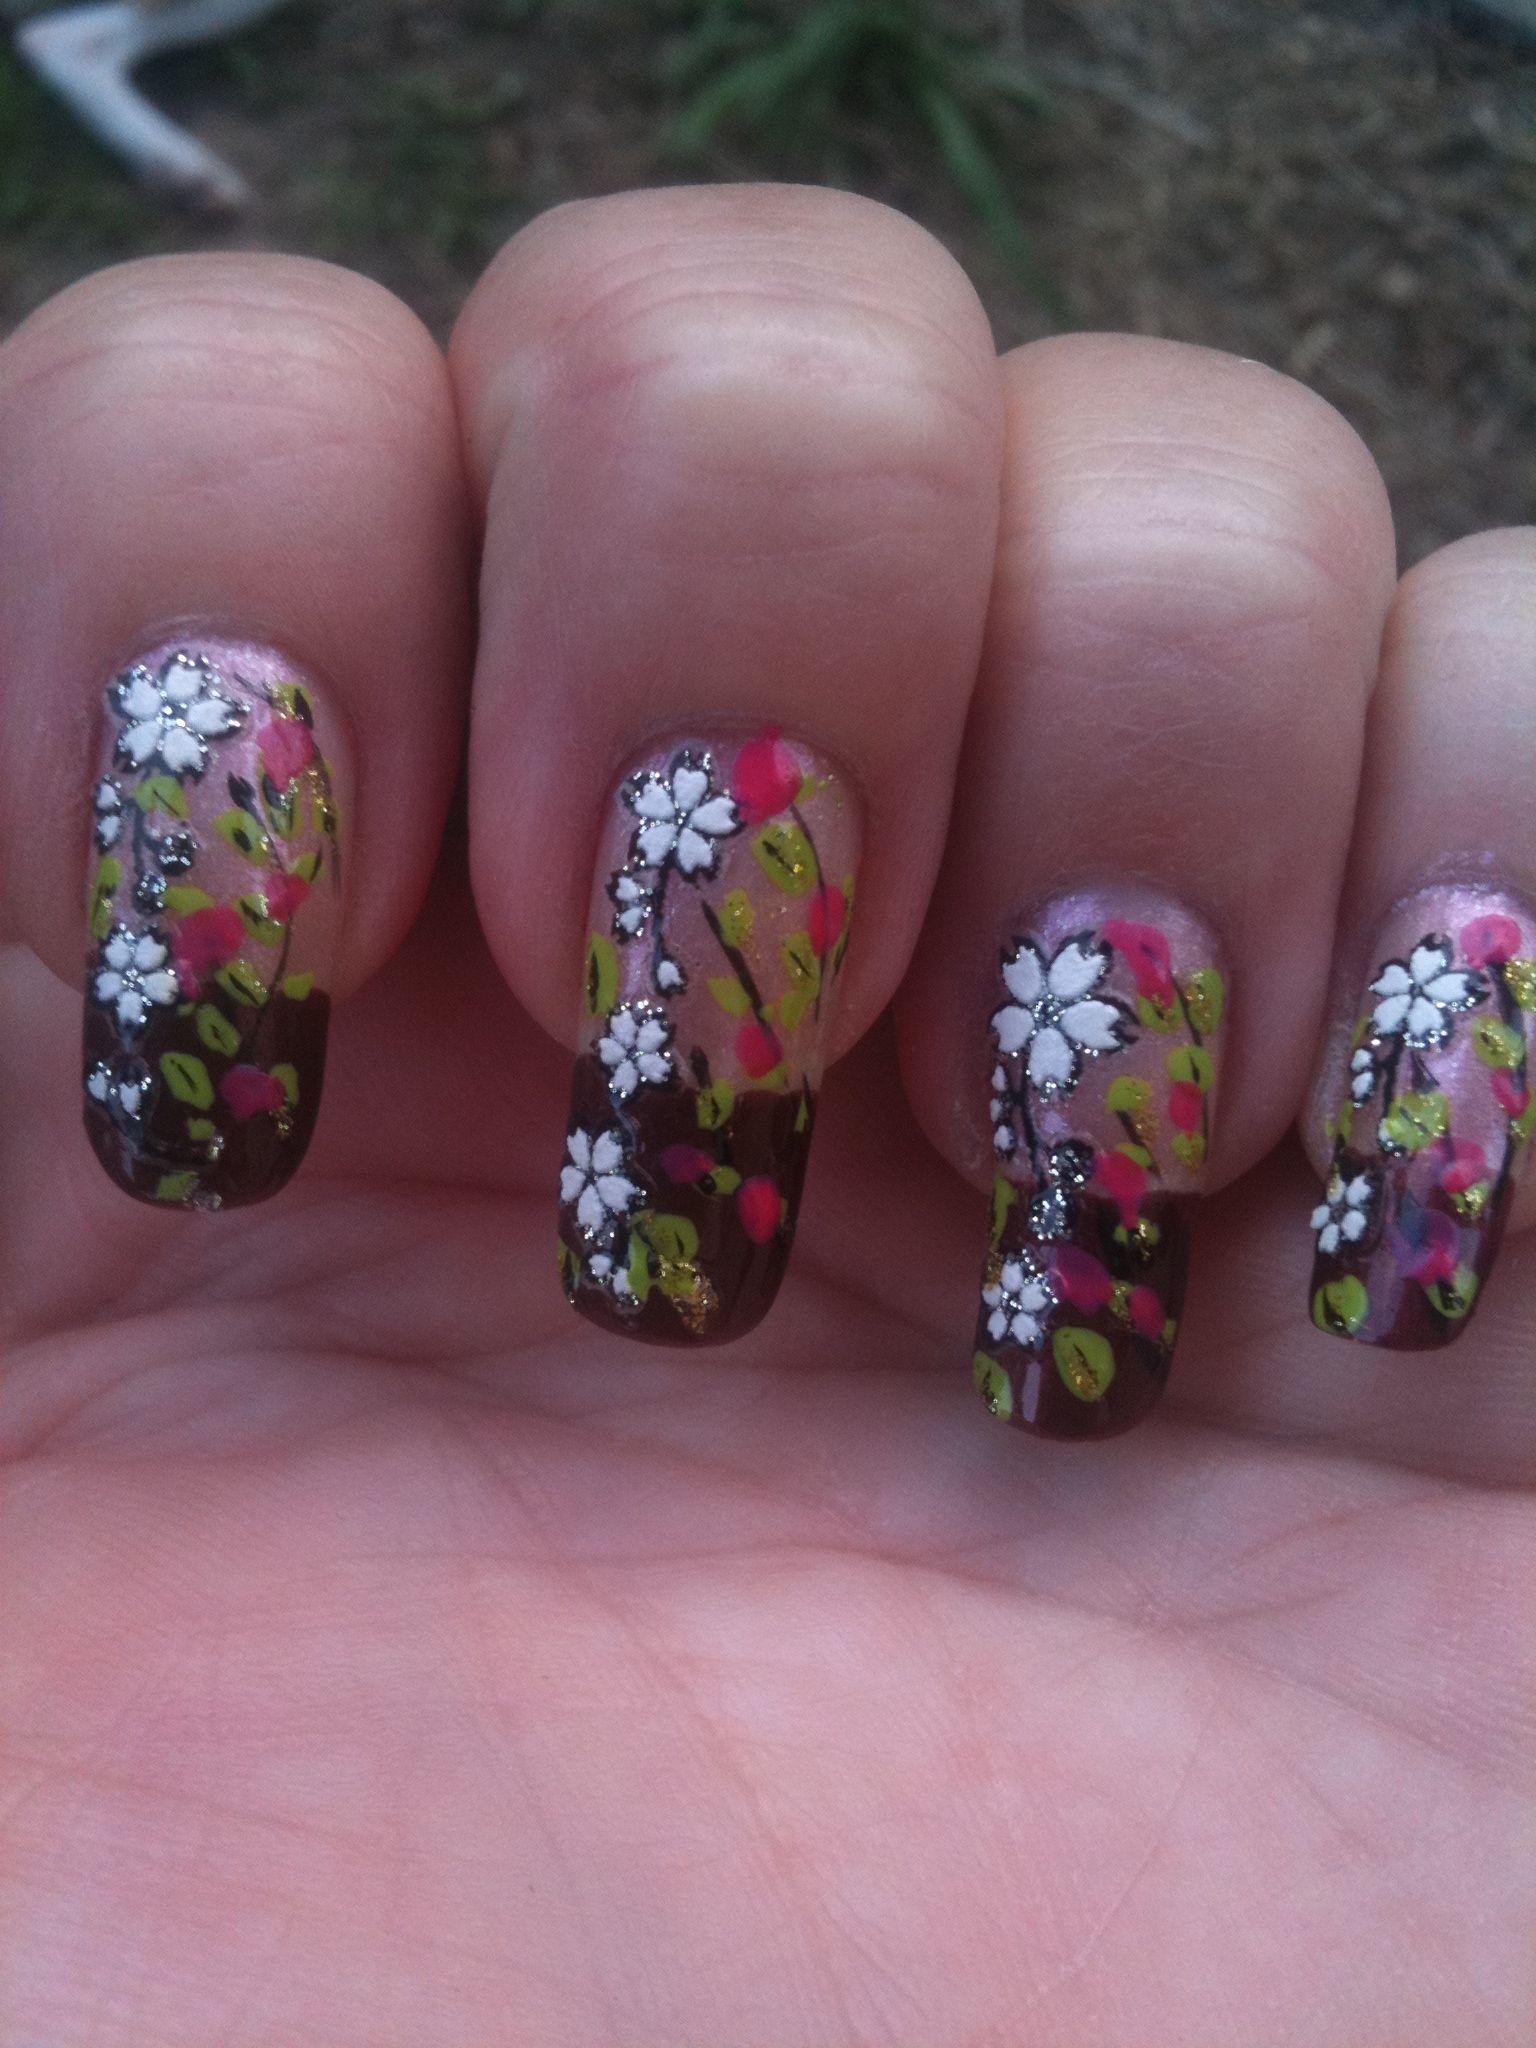 Fancy fingernail designs from home! | Fingernail designs ...